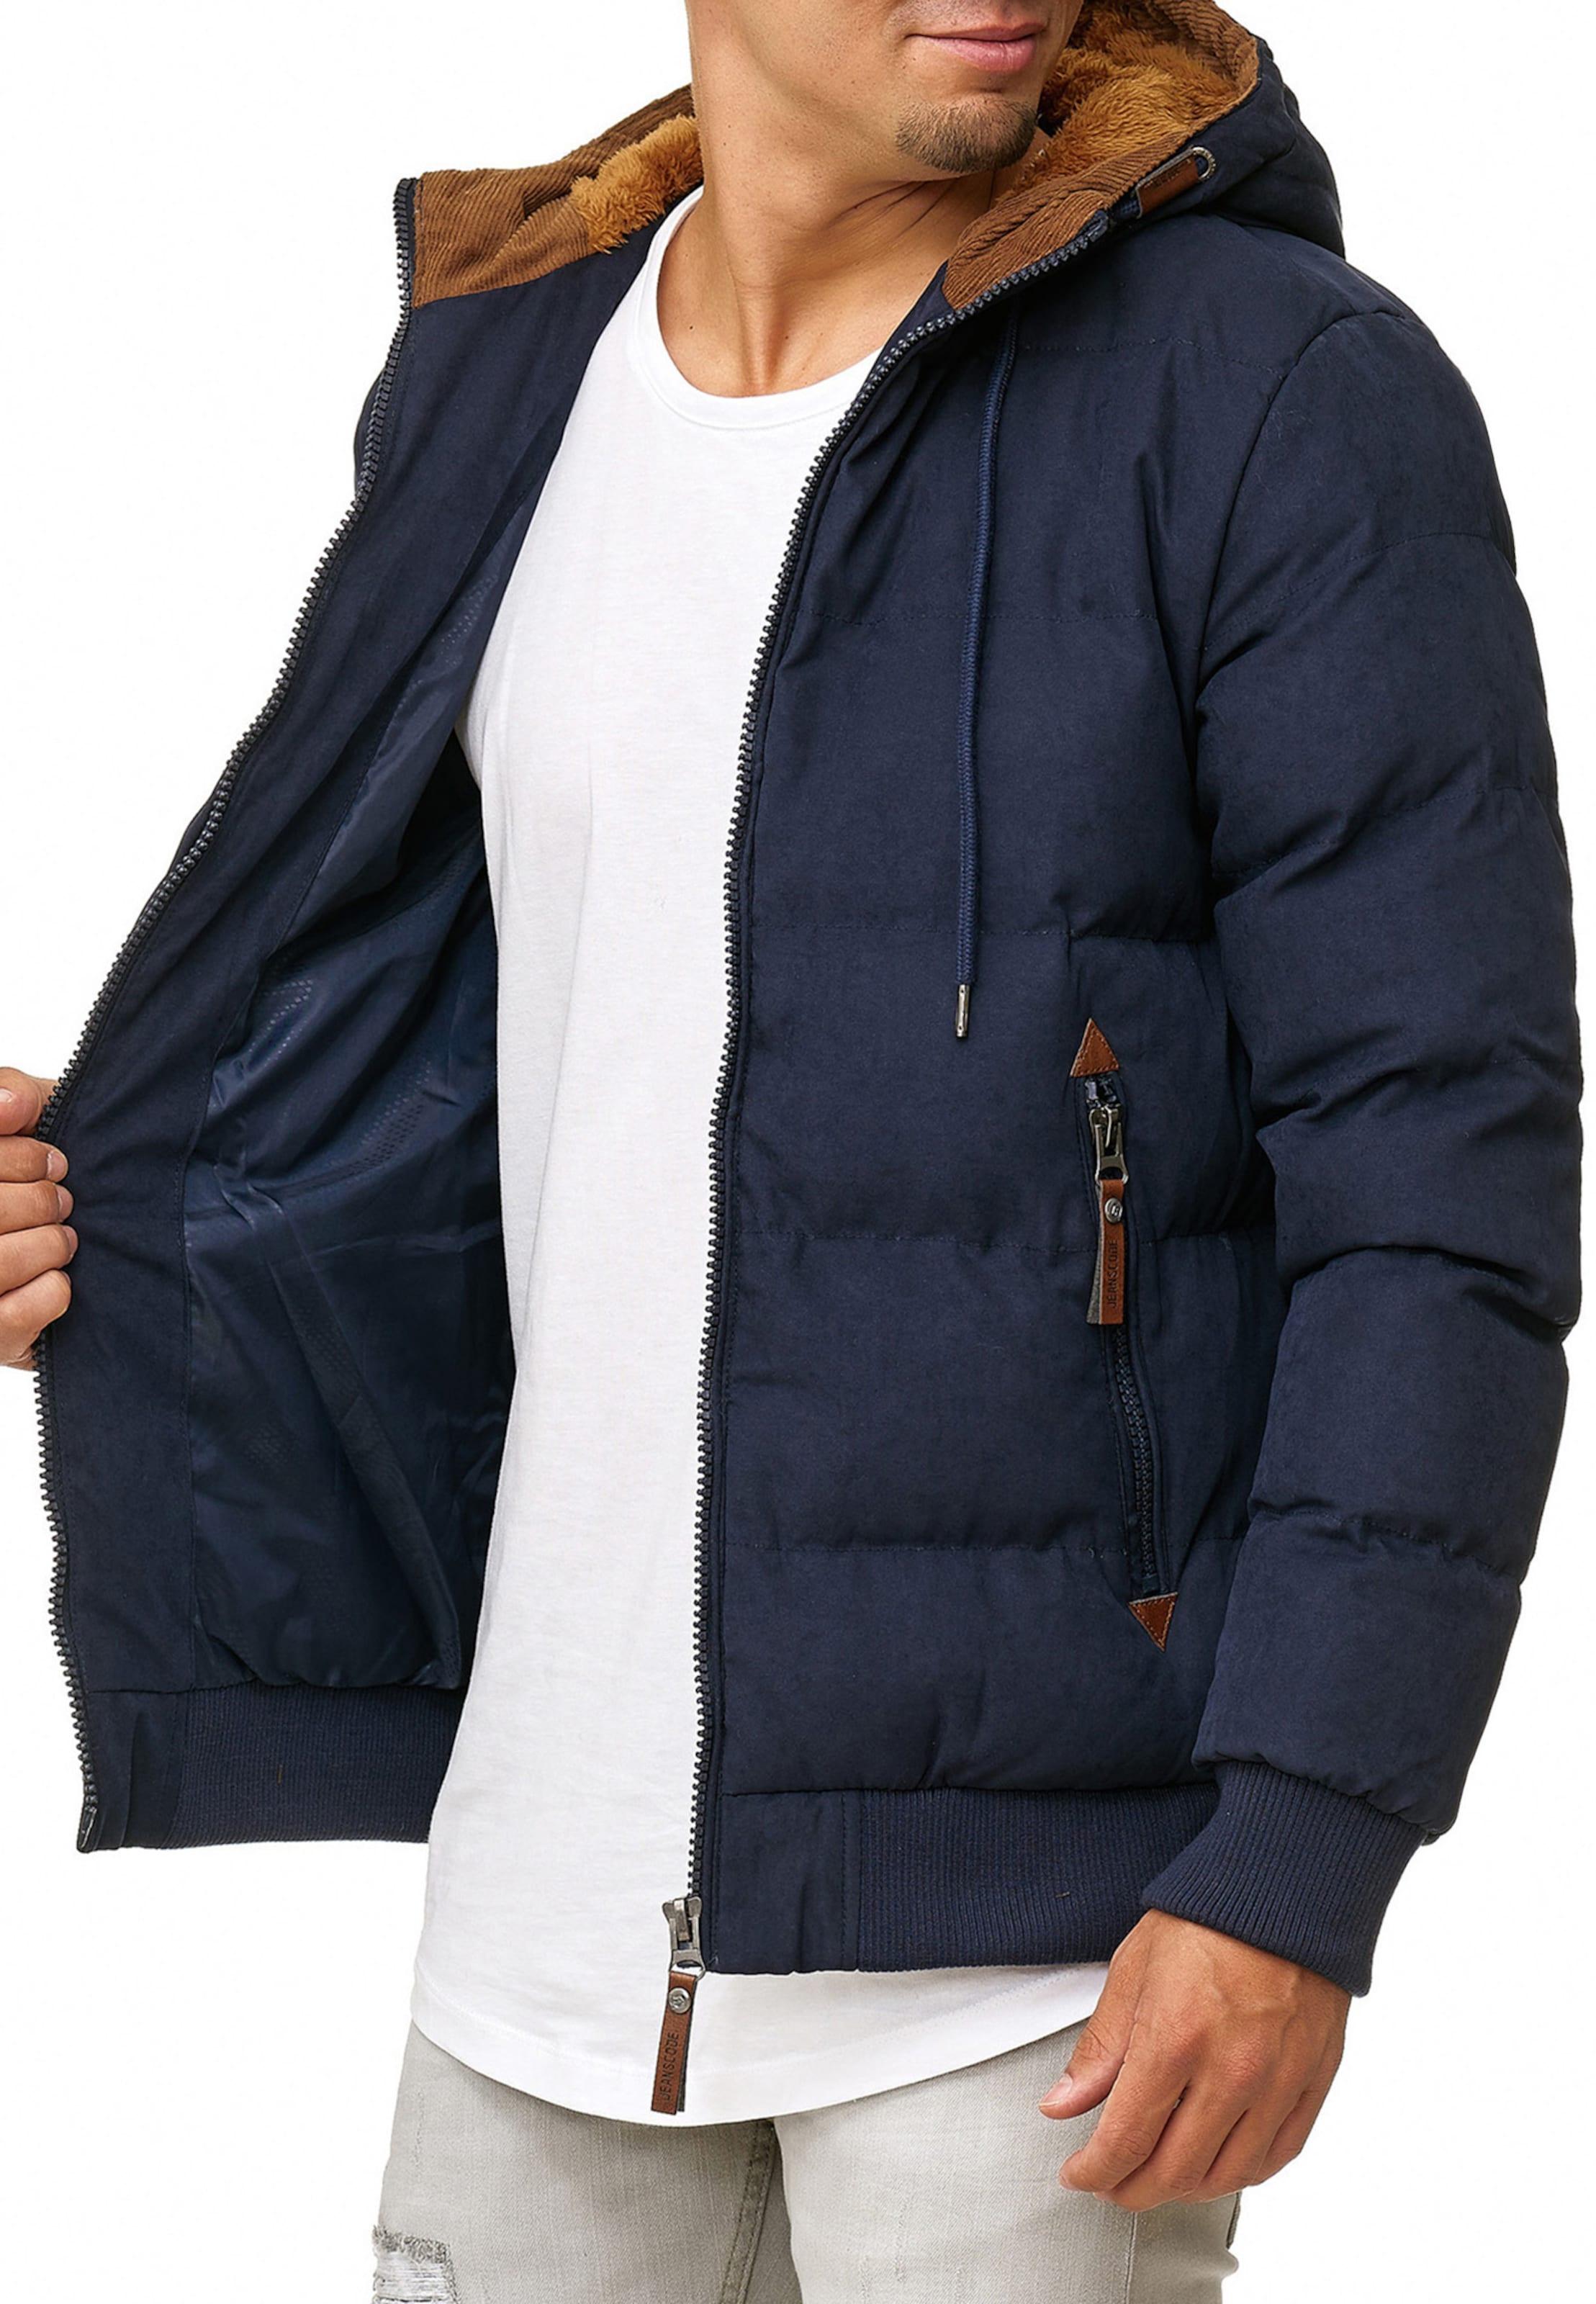 MarineMarron Bleu Jeans Veste D'hiver En 'adeline' Indicode 3uK1JTlFc